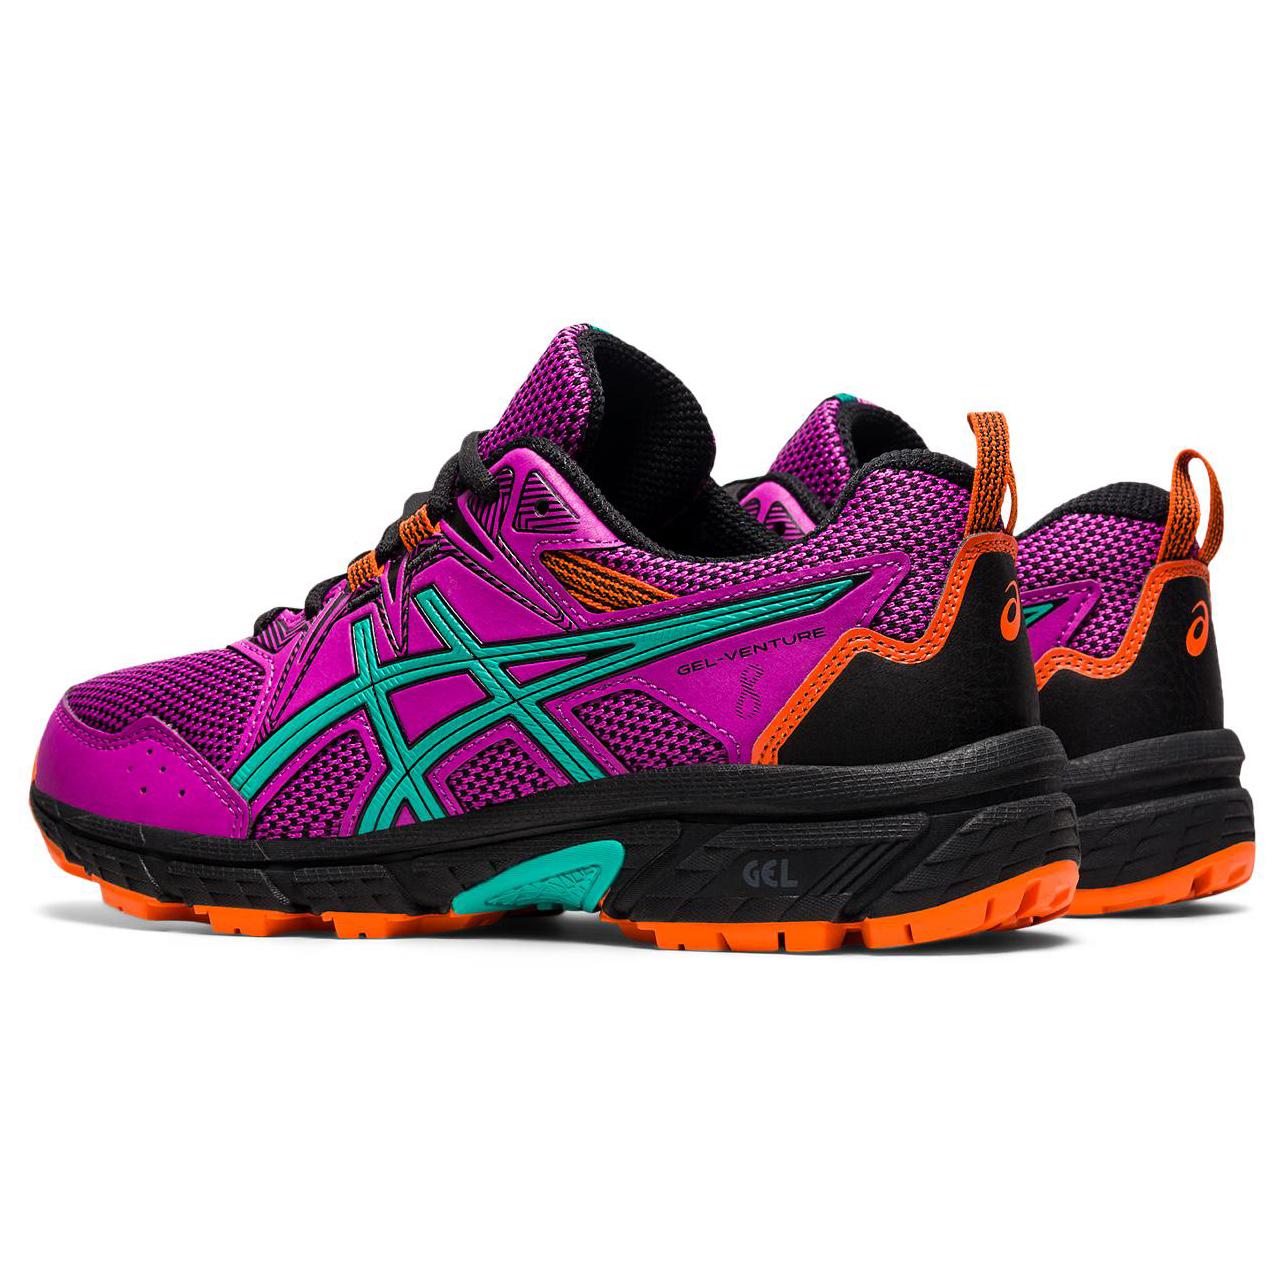 Asics Gel-Venture 8 GS - Multisport shoes Kids | Buy online ...